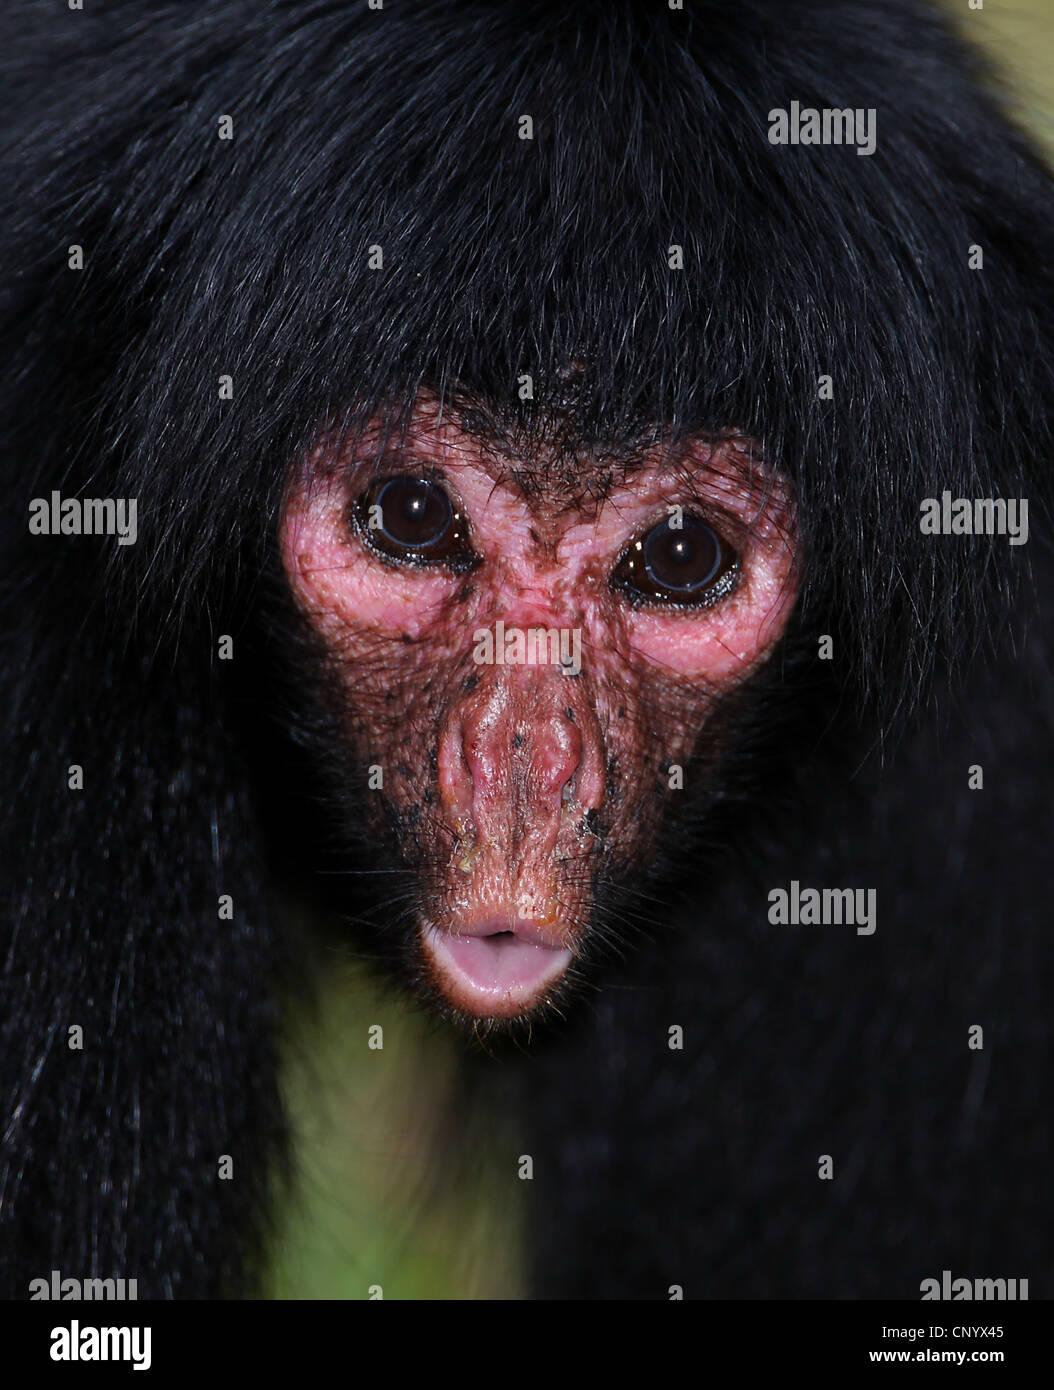 Red-faced Black Spider Monkey (Ateles paniscus), portrait, Brazil, Para Stock Photo